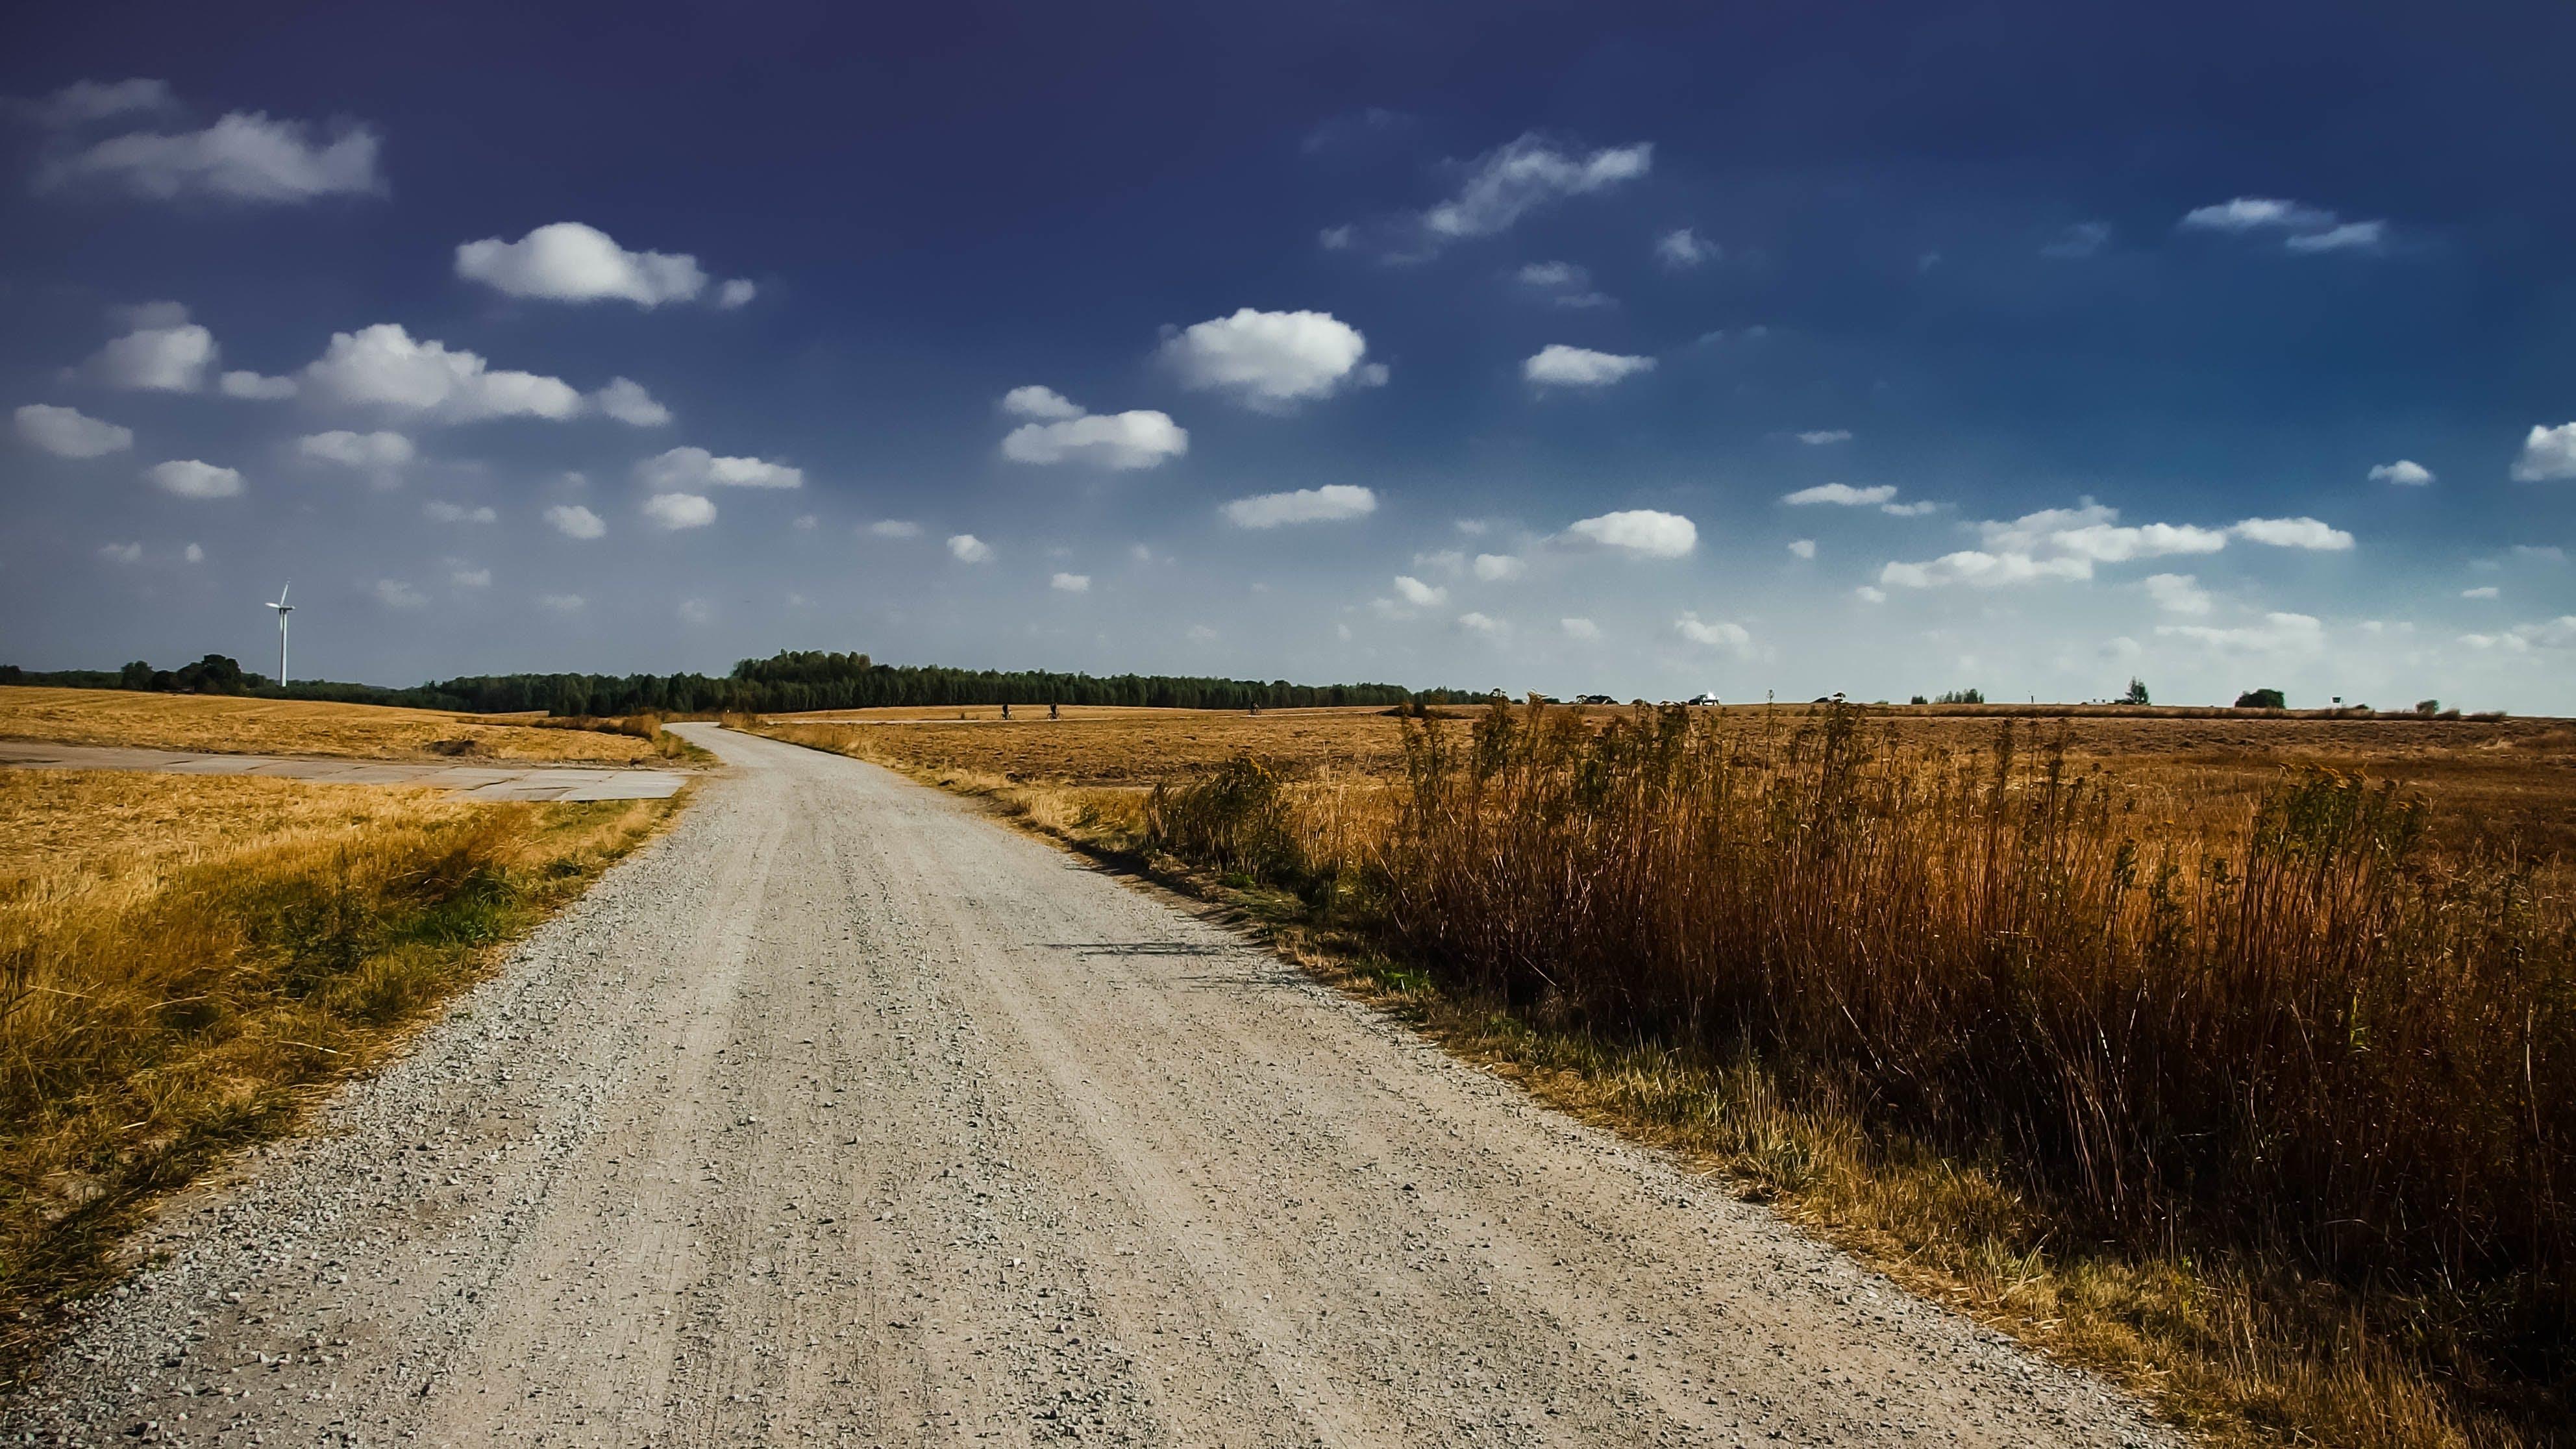 Kostenloses Stock Foto zu felder, feldweg, himmel, natur